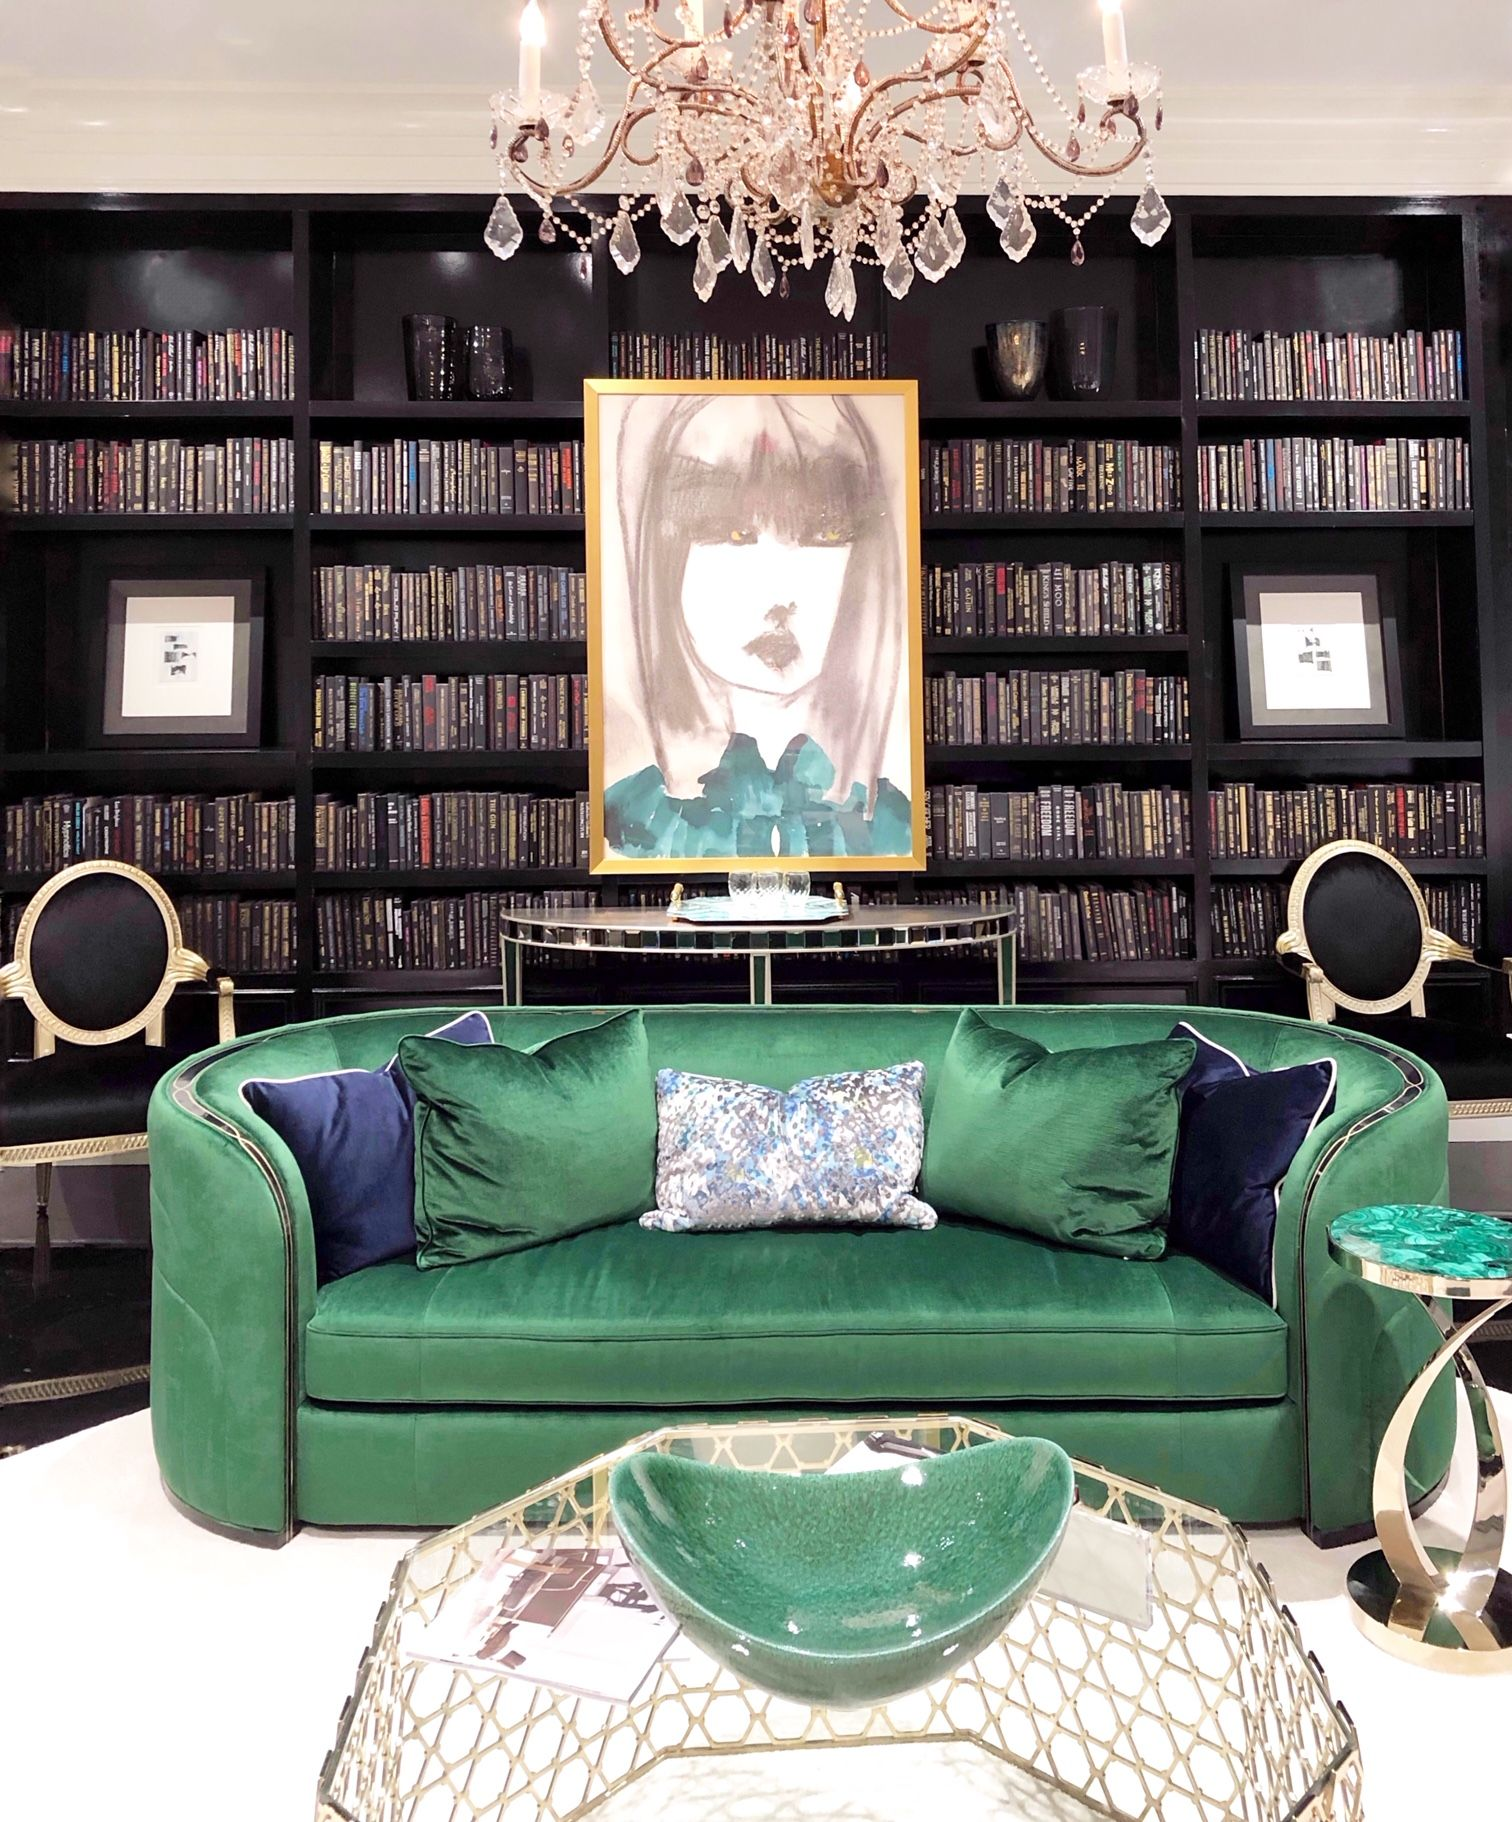 Color And Design Trends From Spring 2019 High Point Market Part One Furniture Interior Design Furniture Design